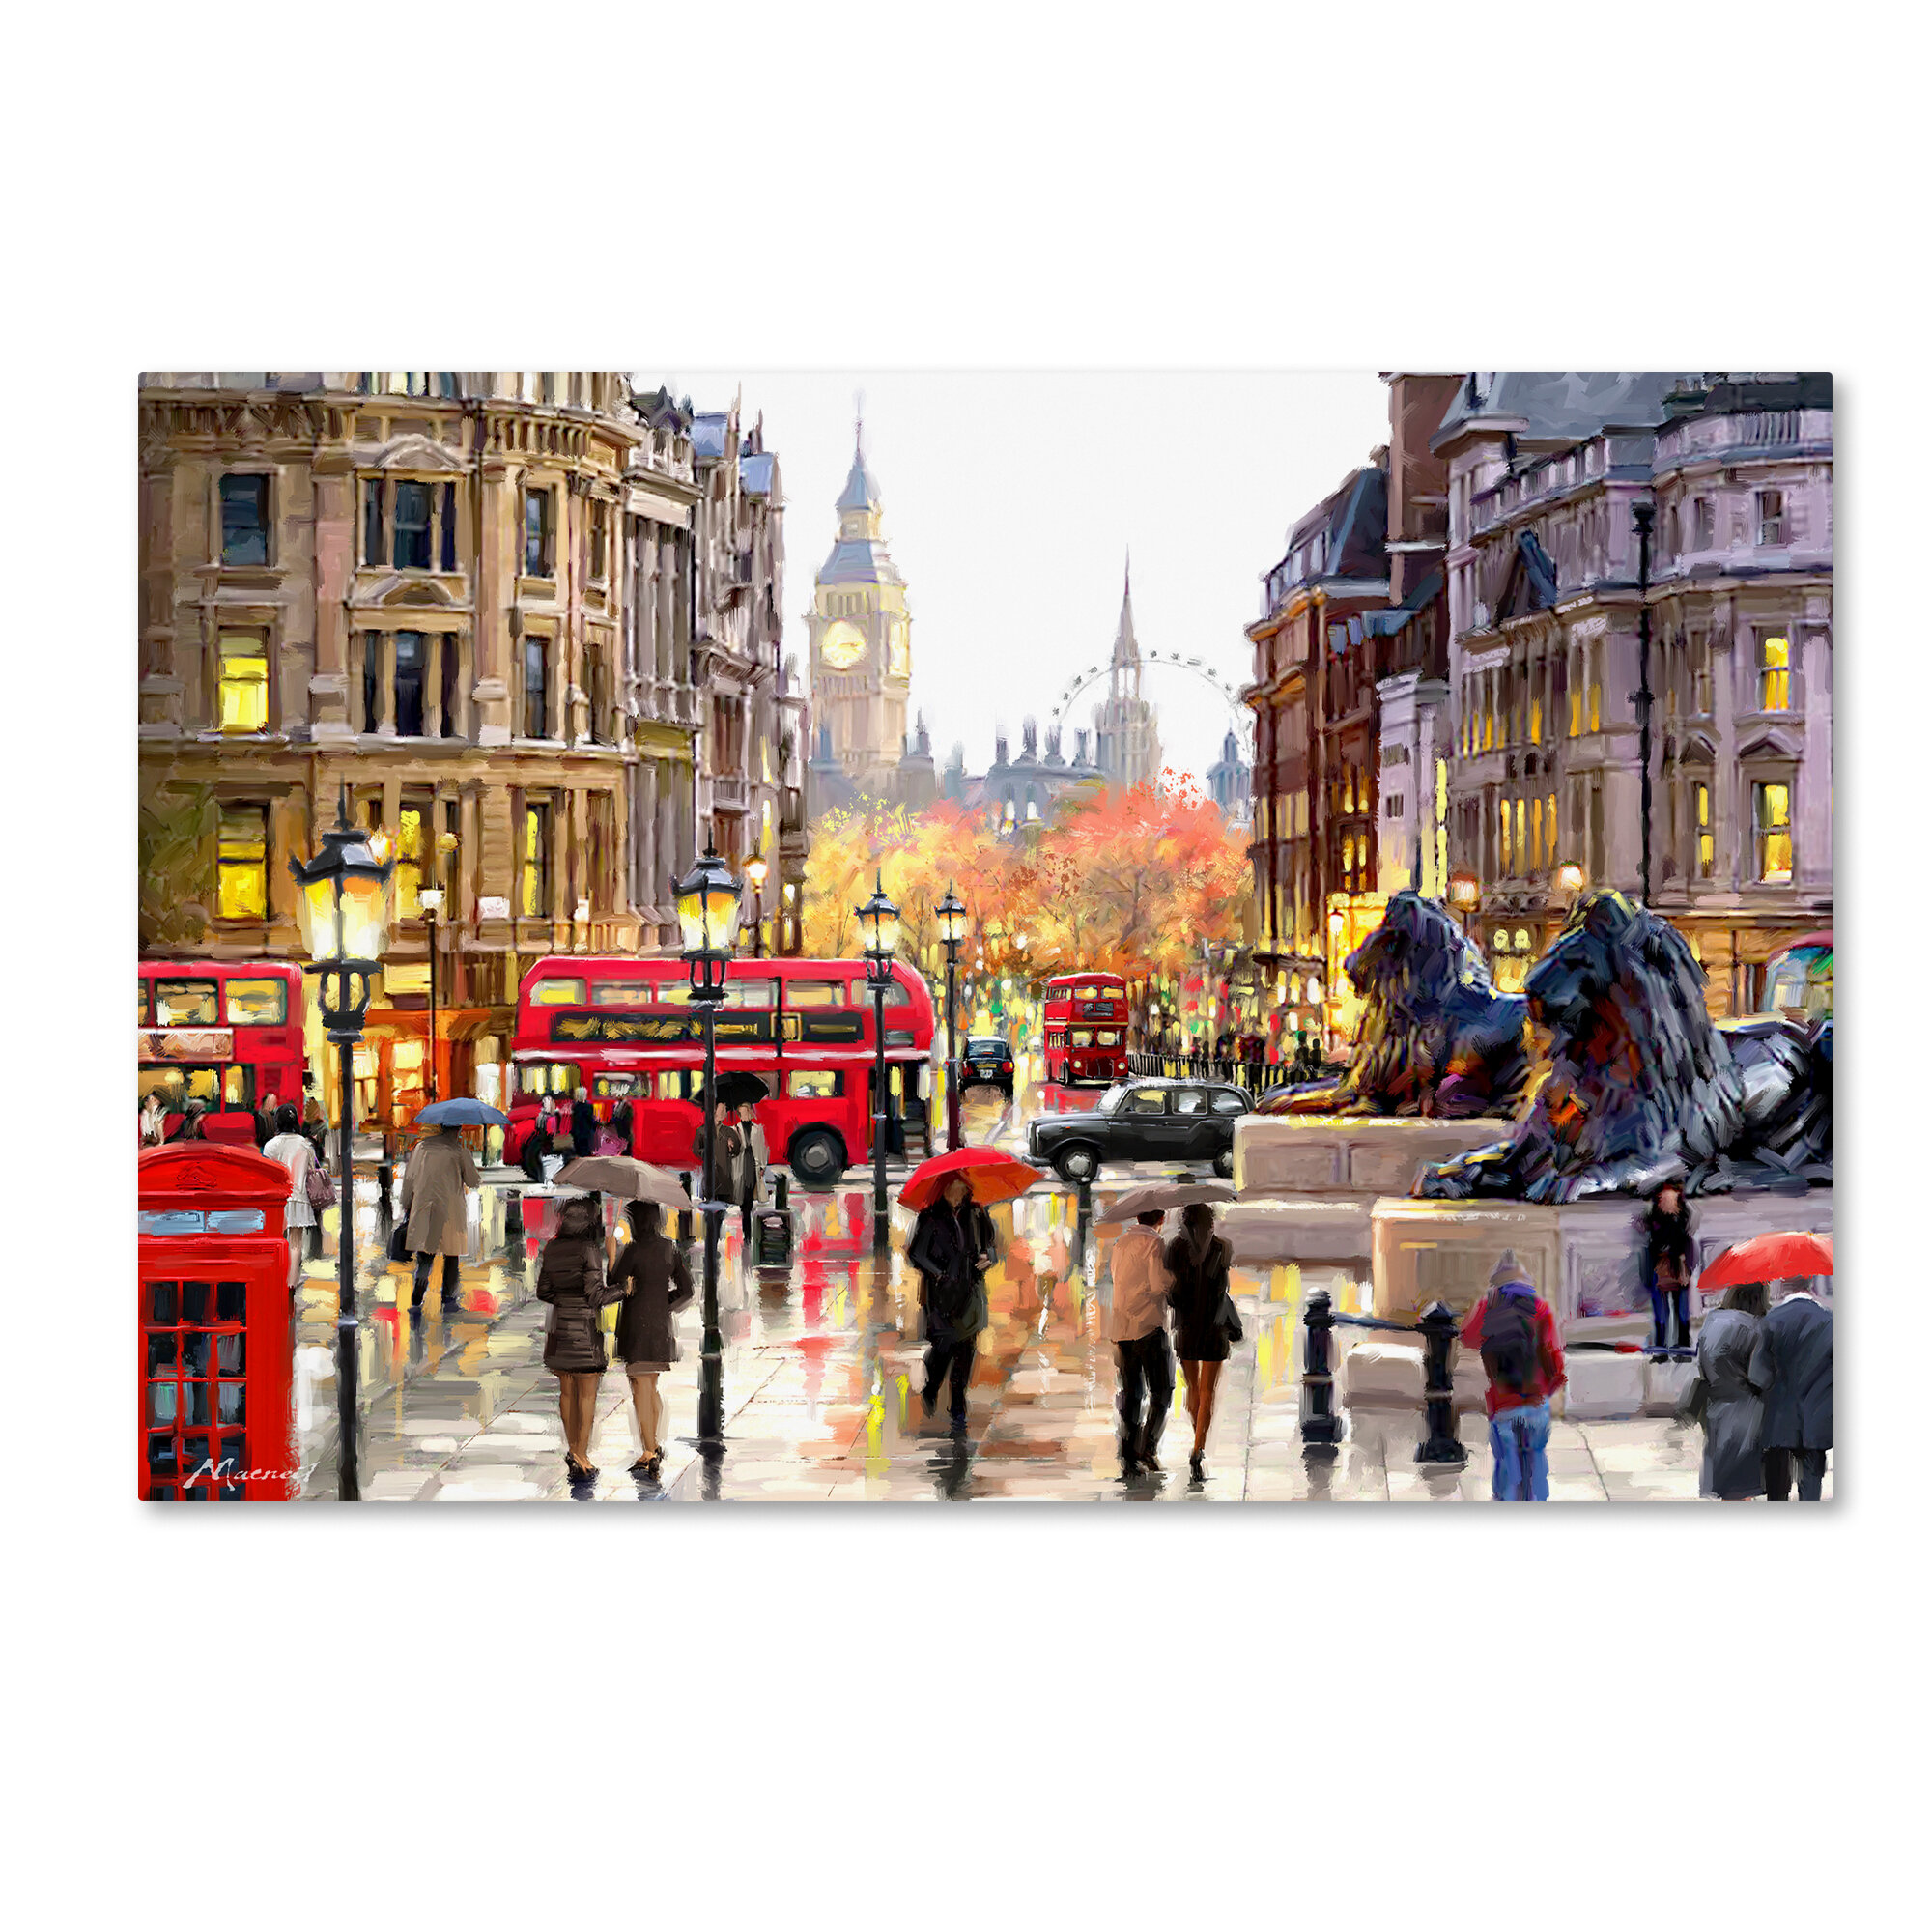 Trademark Art London Landscape By The Macneil Studio Print Reviews Wayfair